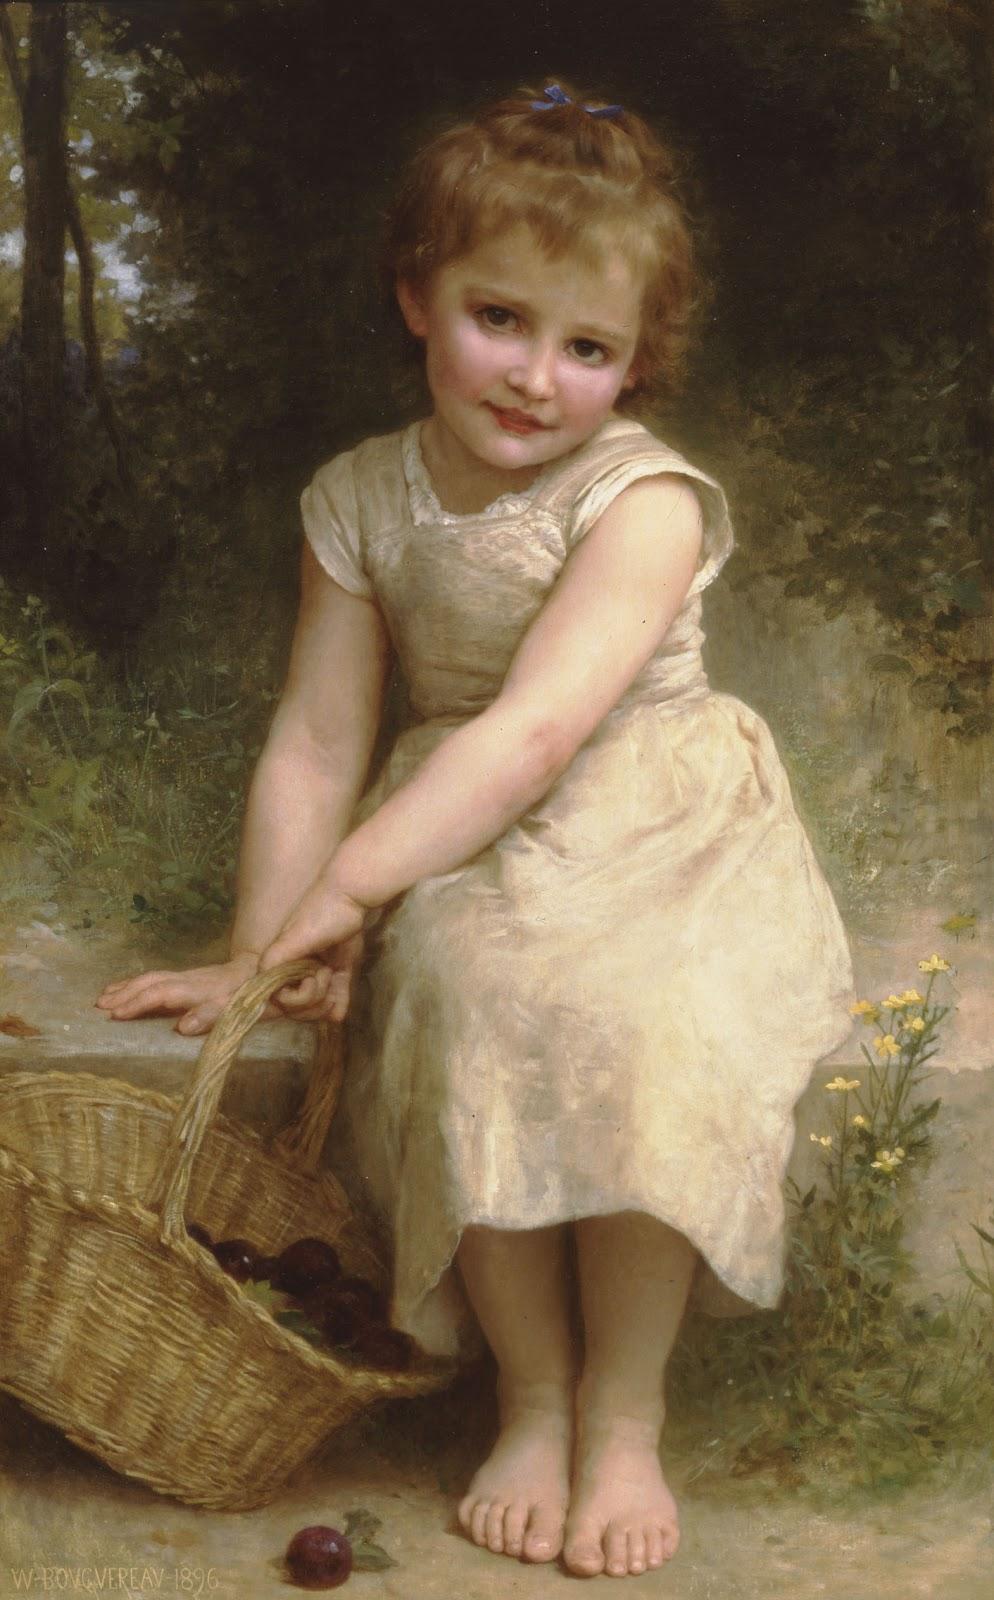 Les Prunes. 1896. Óleo sobre tela - 96.5 x 60.5 cm